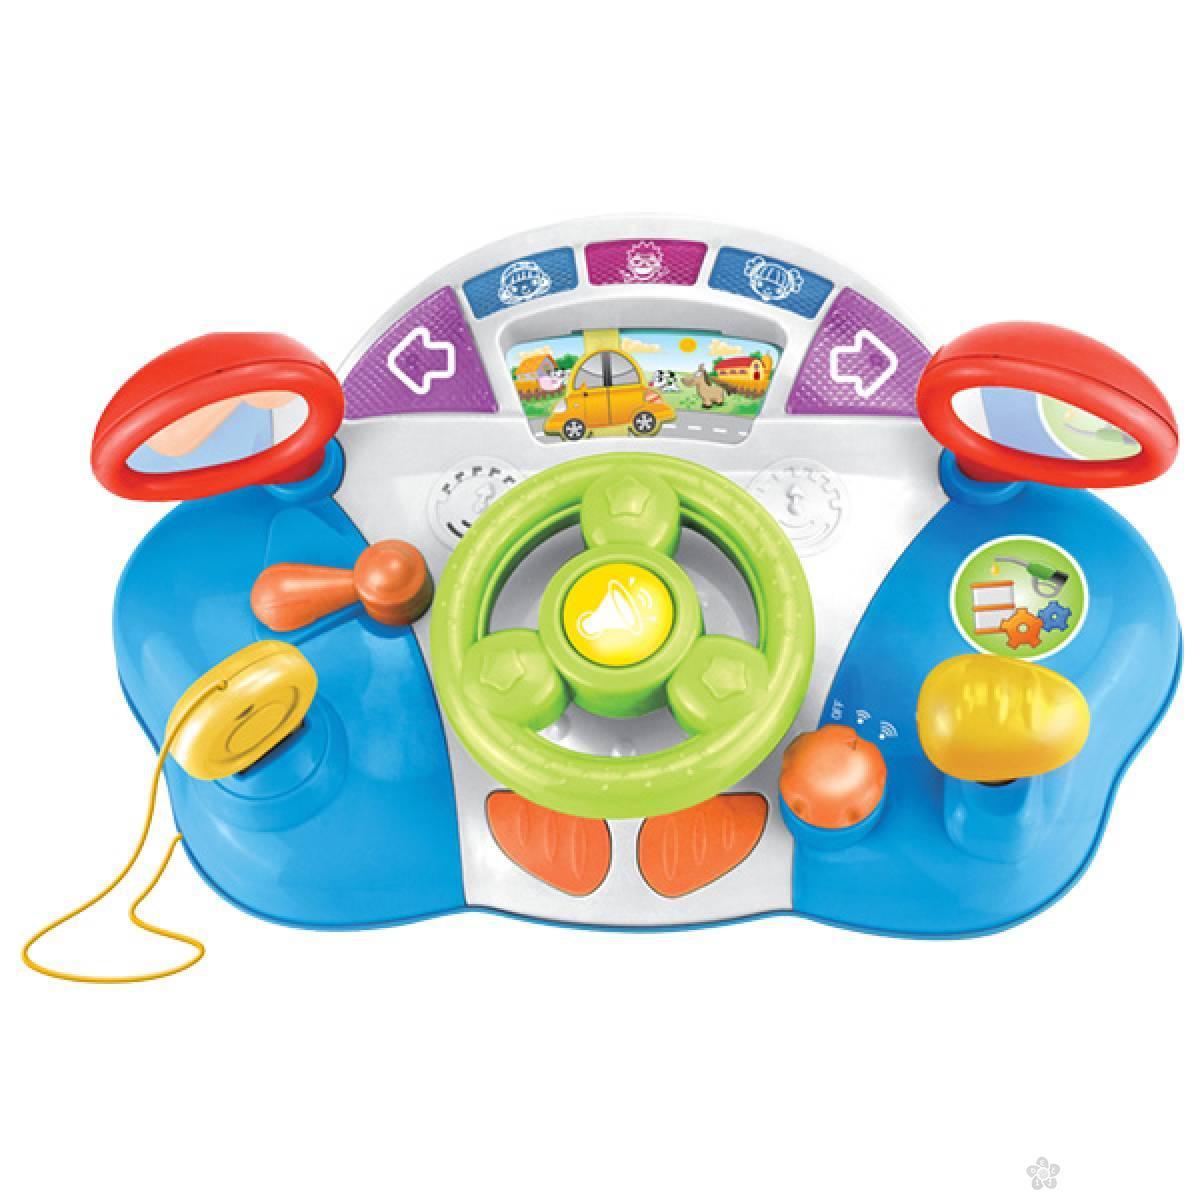 Bebi muzički aktiviti volan 22871